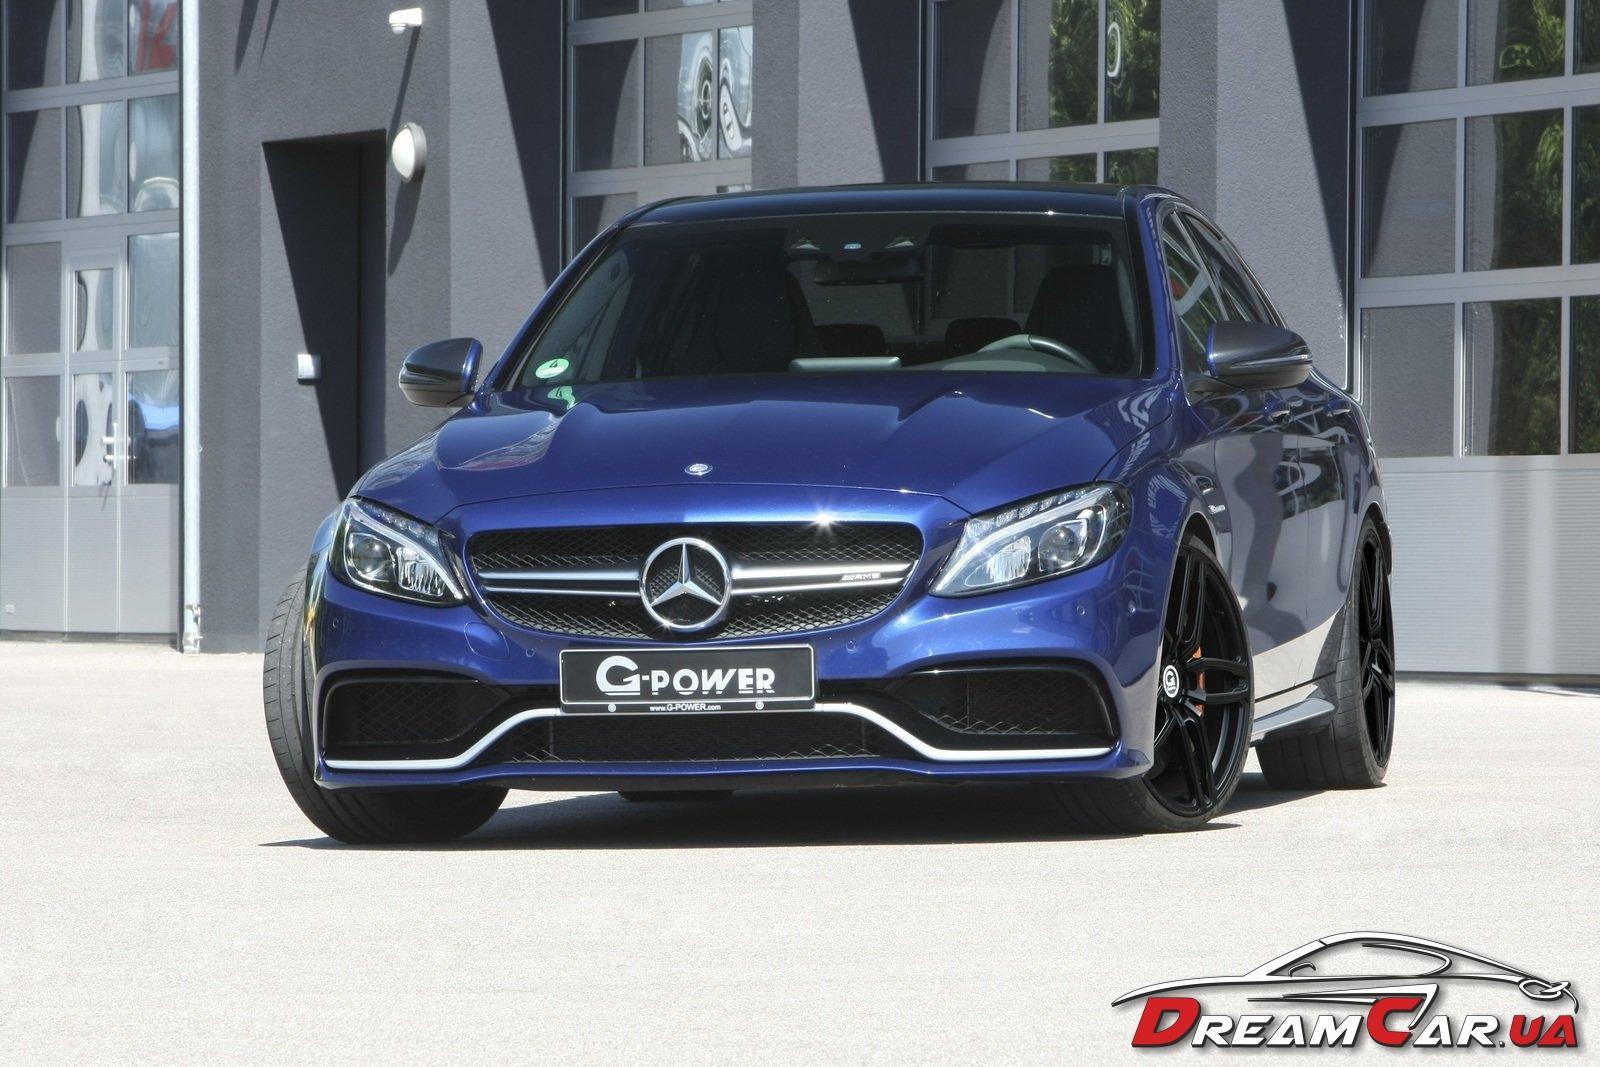 Mercedes C63 S G-power 3